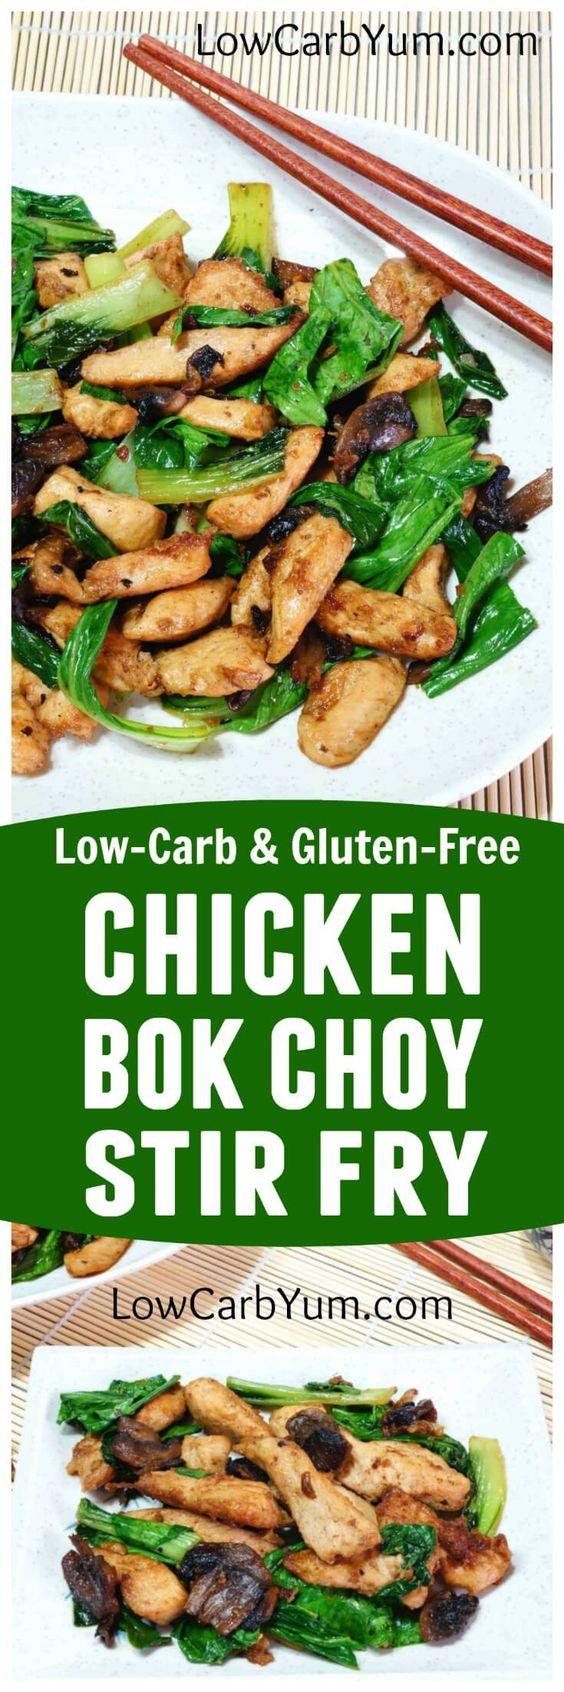 Bok choy stir fry, Gluten free chicken and Stir fry on Pinterest